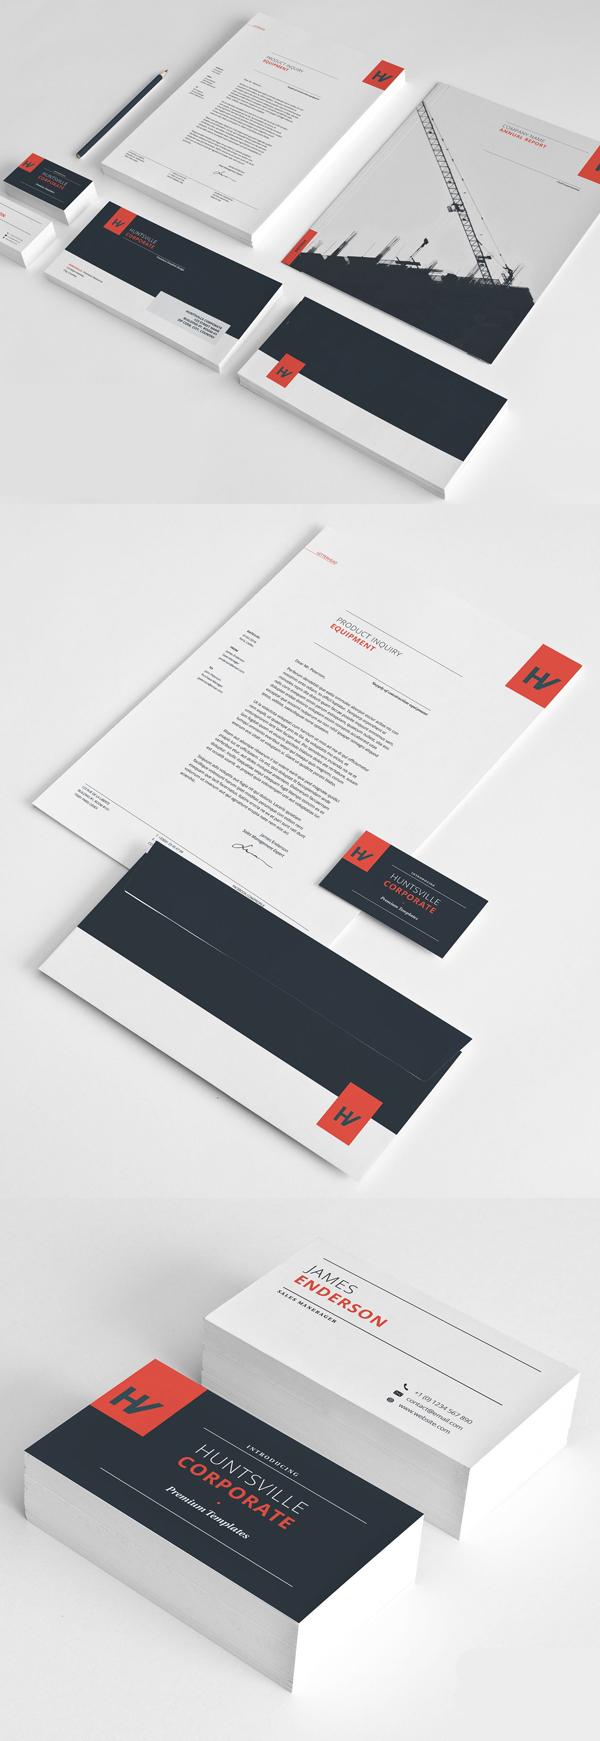 50 Professional Corporate Branding / Stationery Templates Design - 1